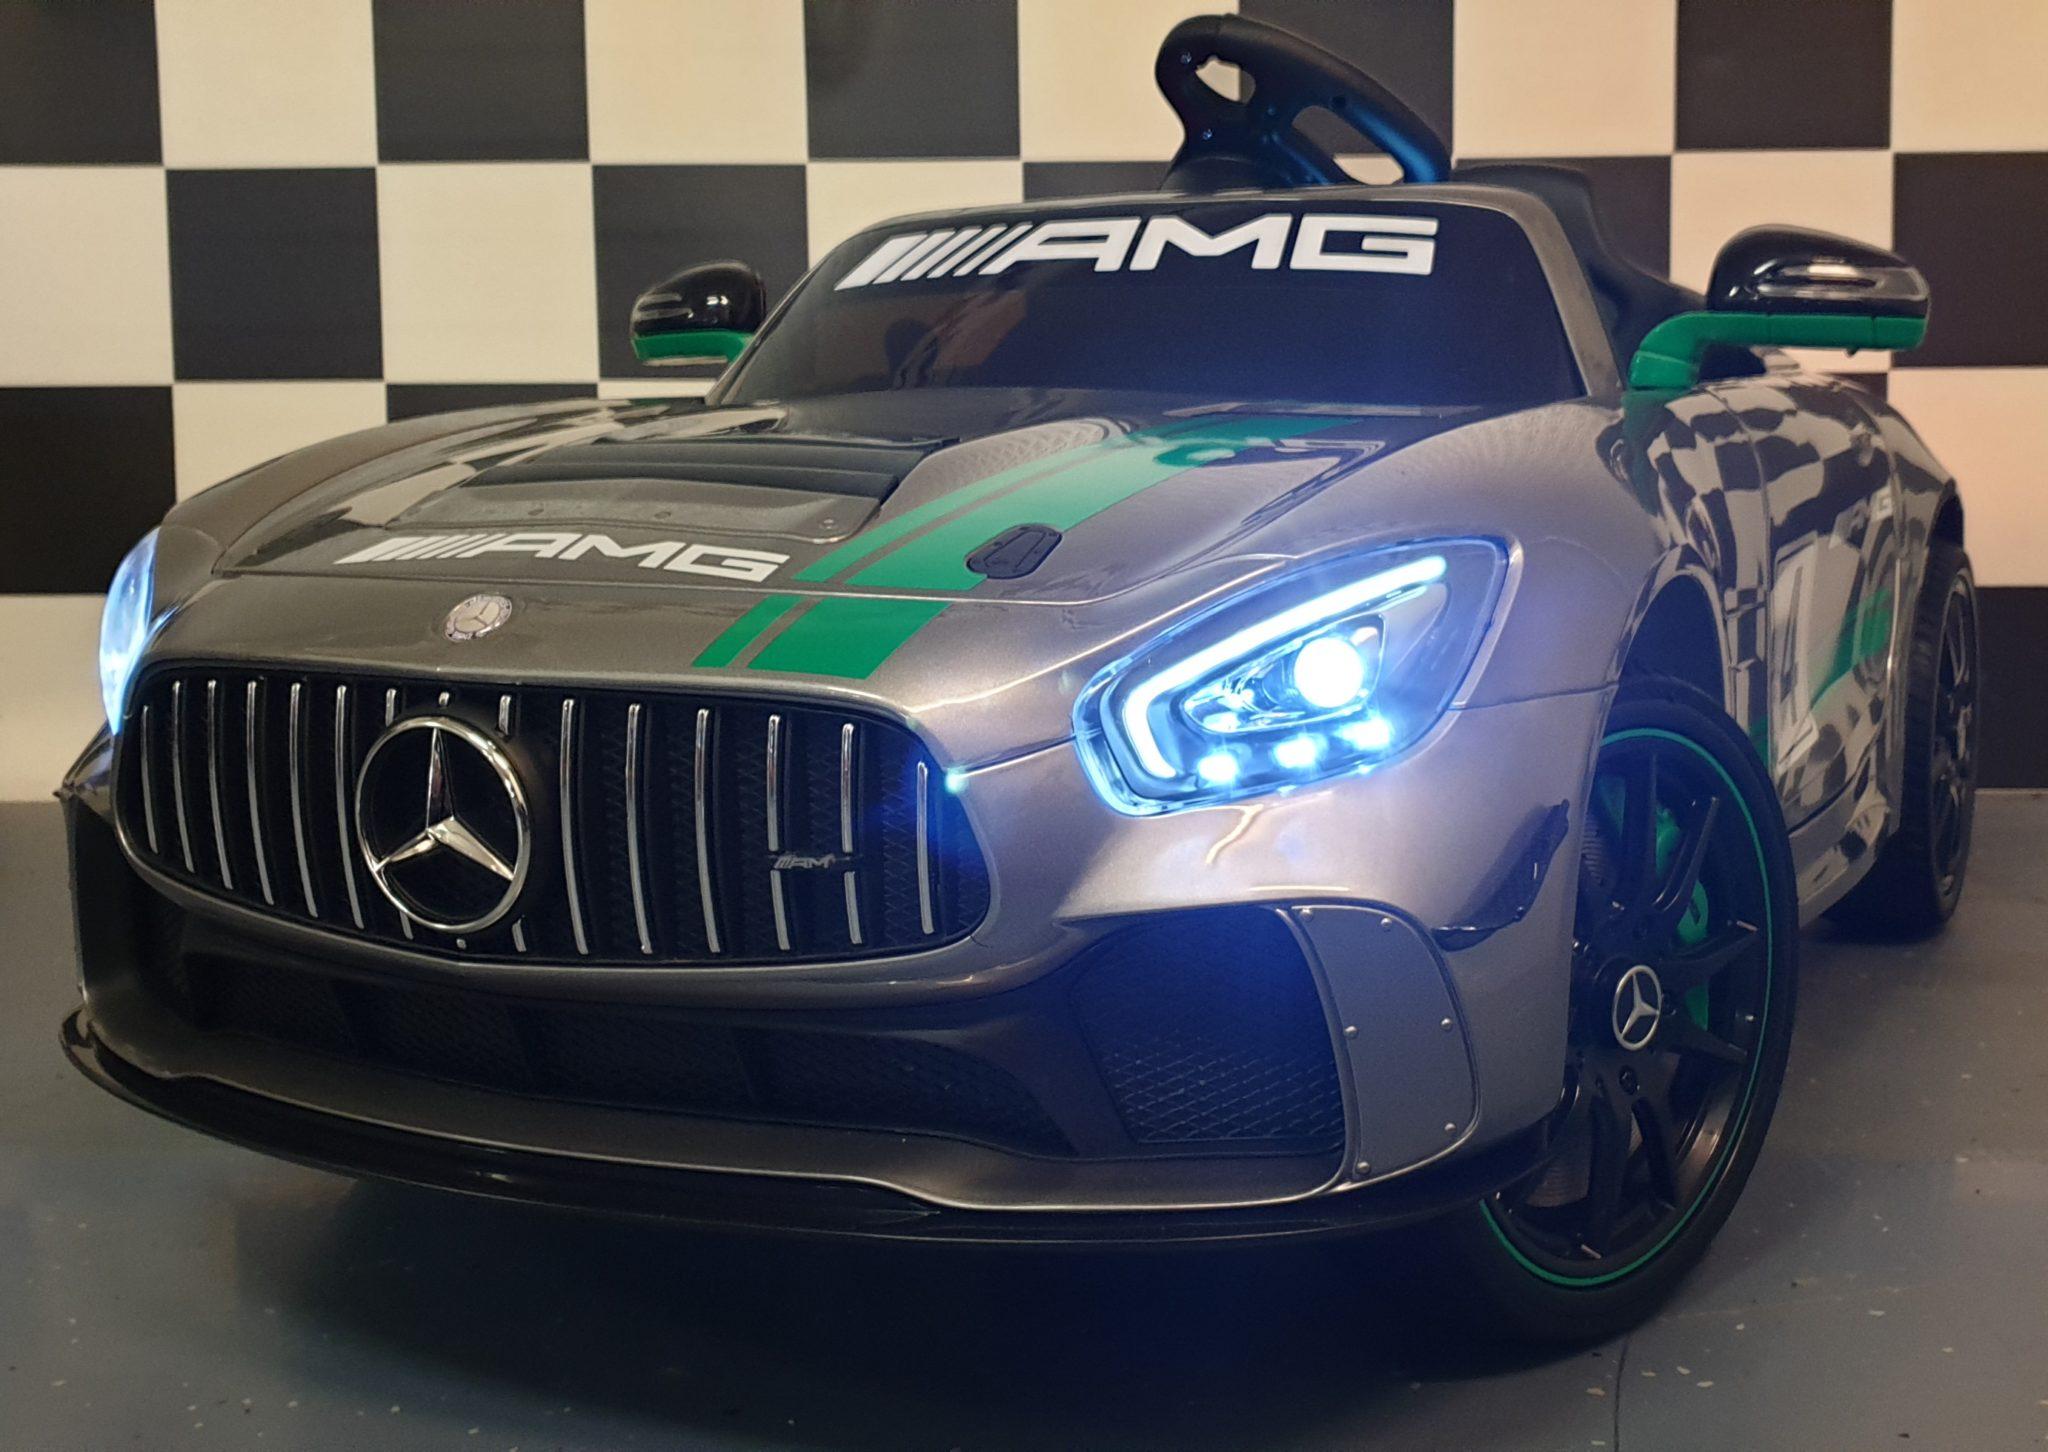 Kinderauto Mercedes GT AMG kinder accu auto 2.4G RC TV scherm 12Volt zilver